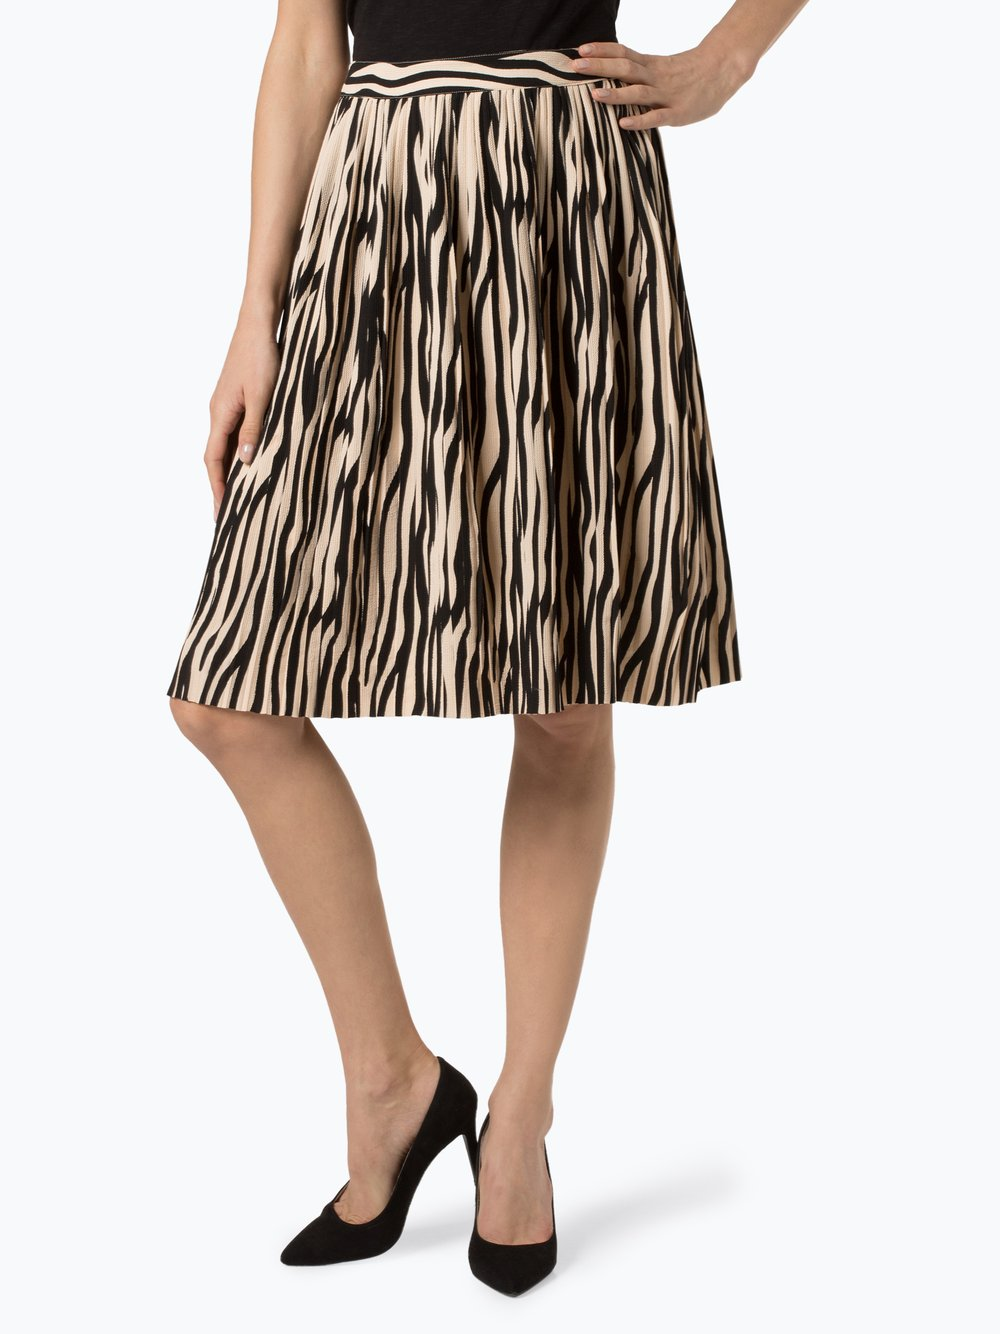 Minimum - Spódnica damska – Fluenca, beżowy Minimum